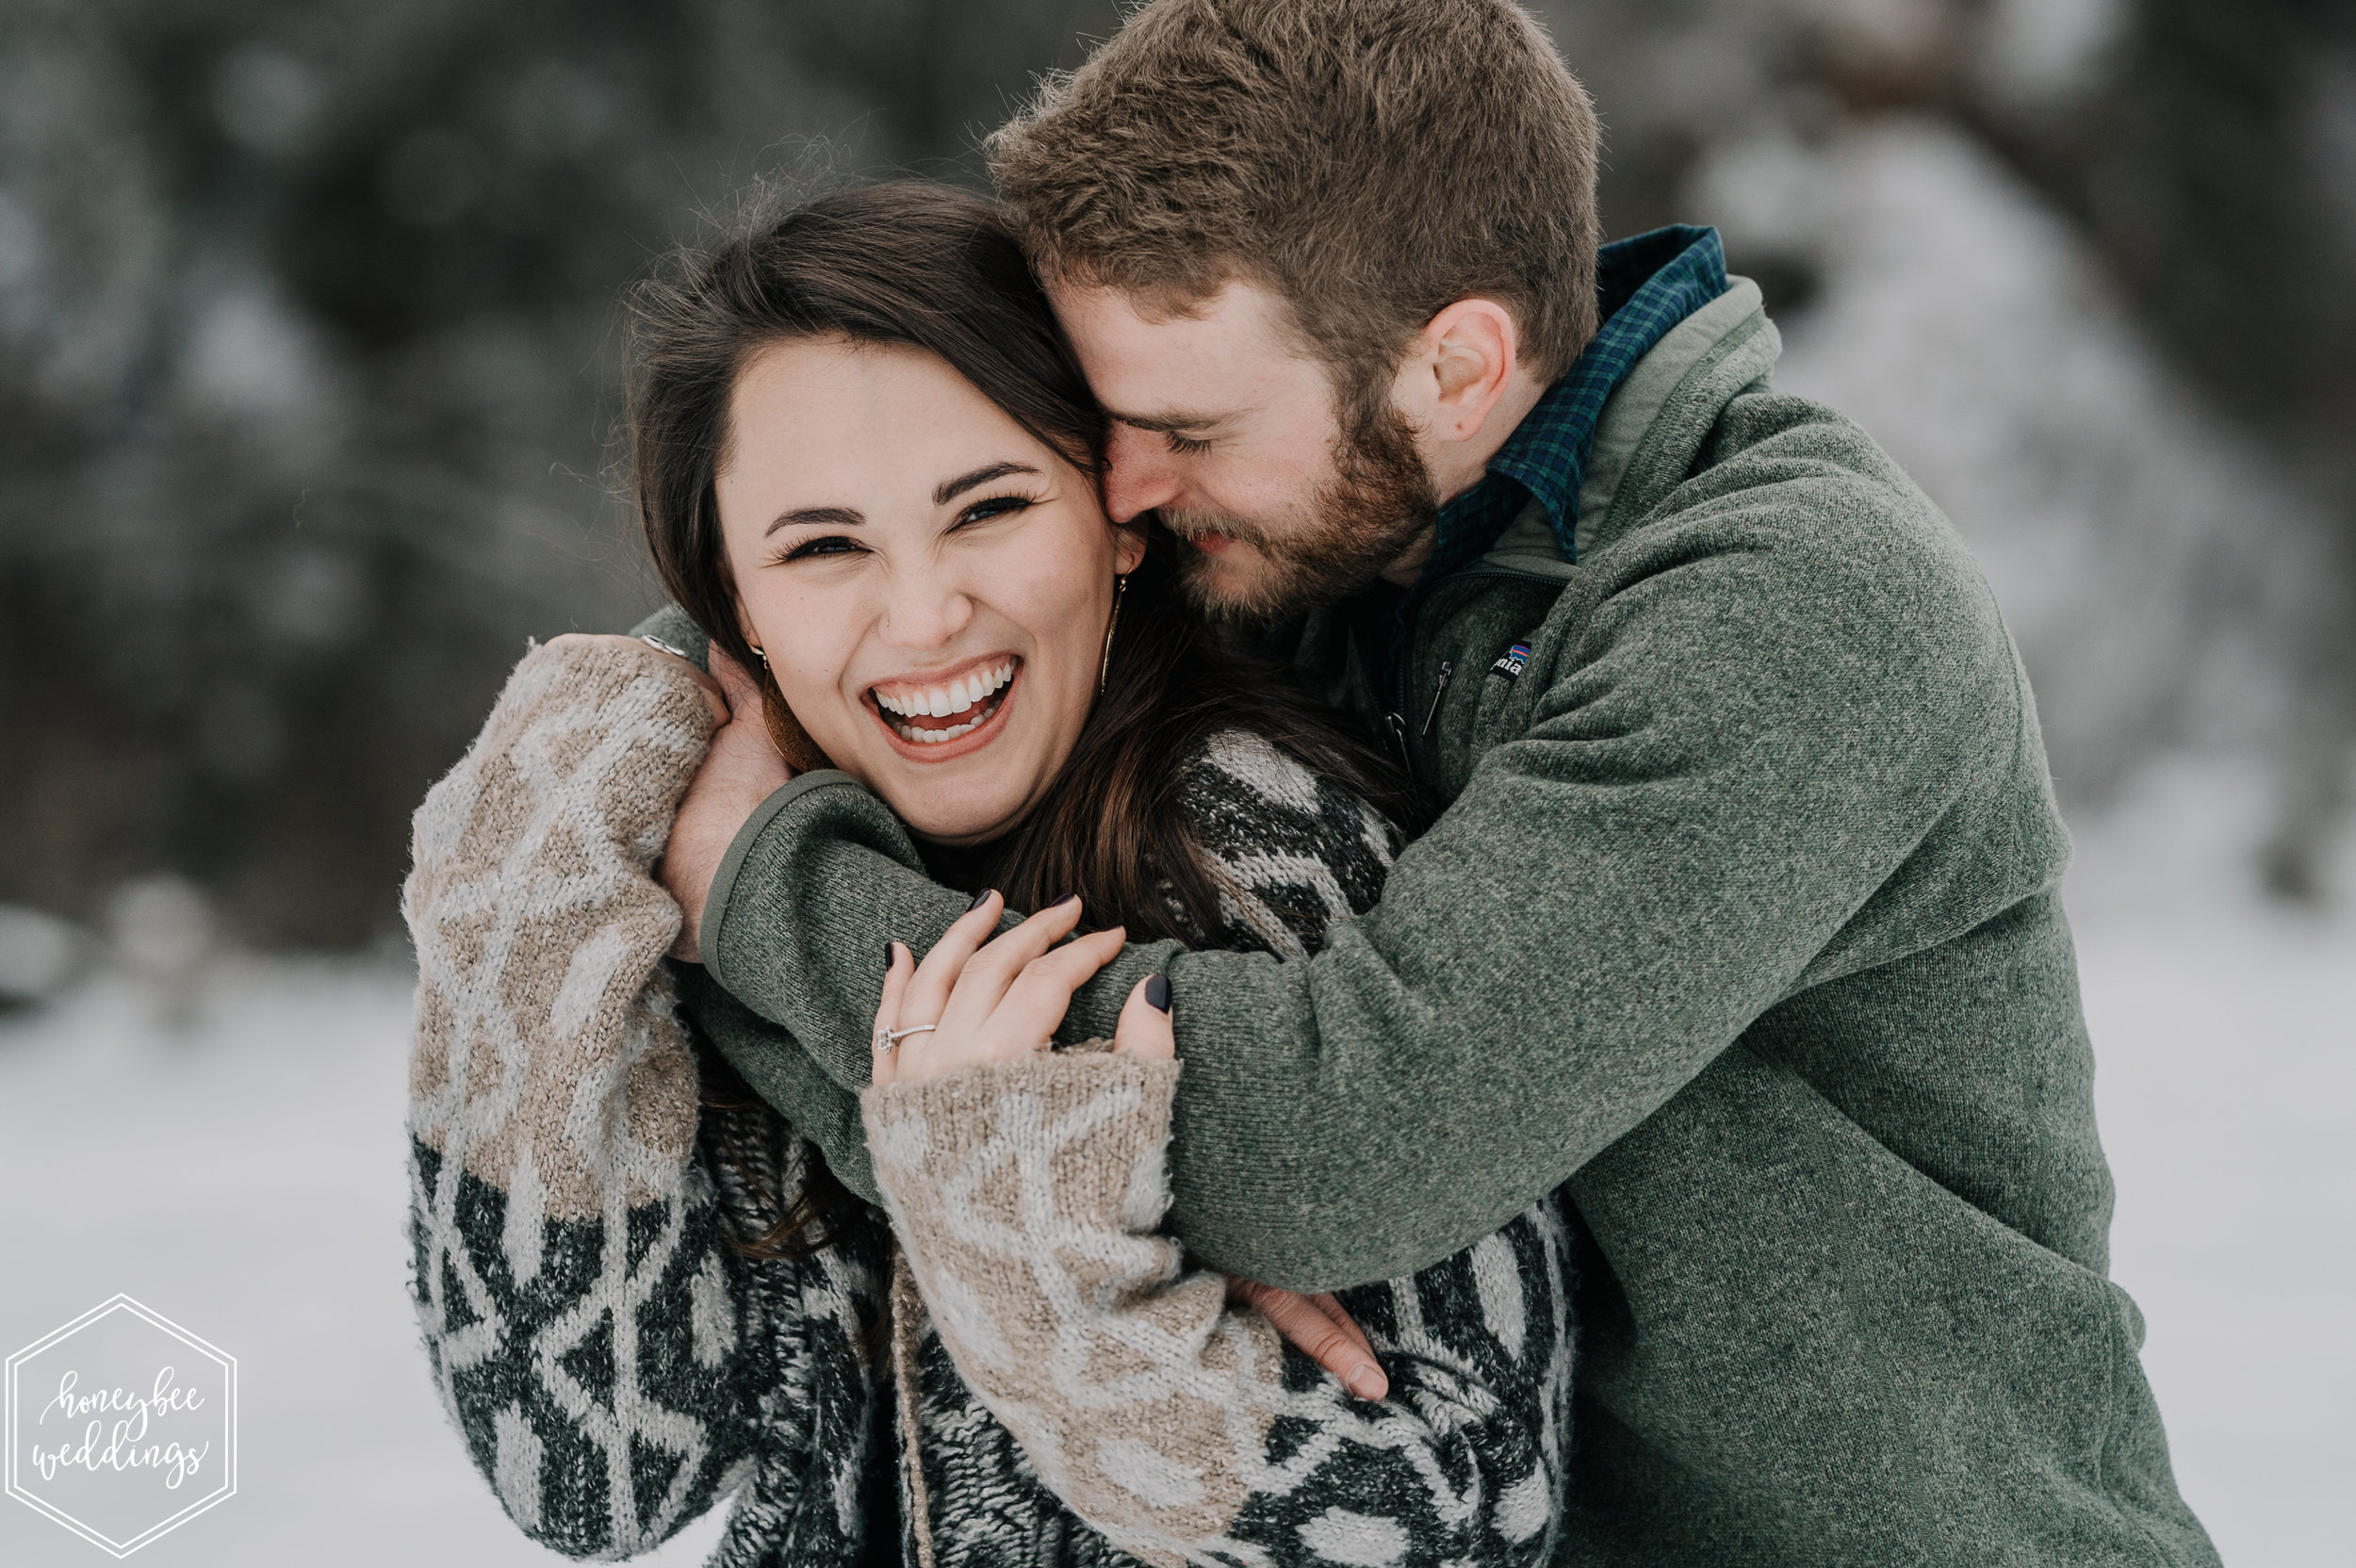 0135Missoula Engagement Session_Rattlesnake Engagement Session_Winter Engagement_Montana Wedding Photographer_Corey & Corey Engagement_December 08, 2018-505.jpg